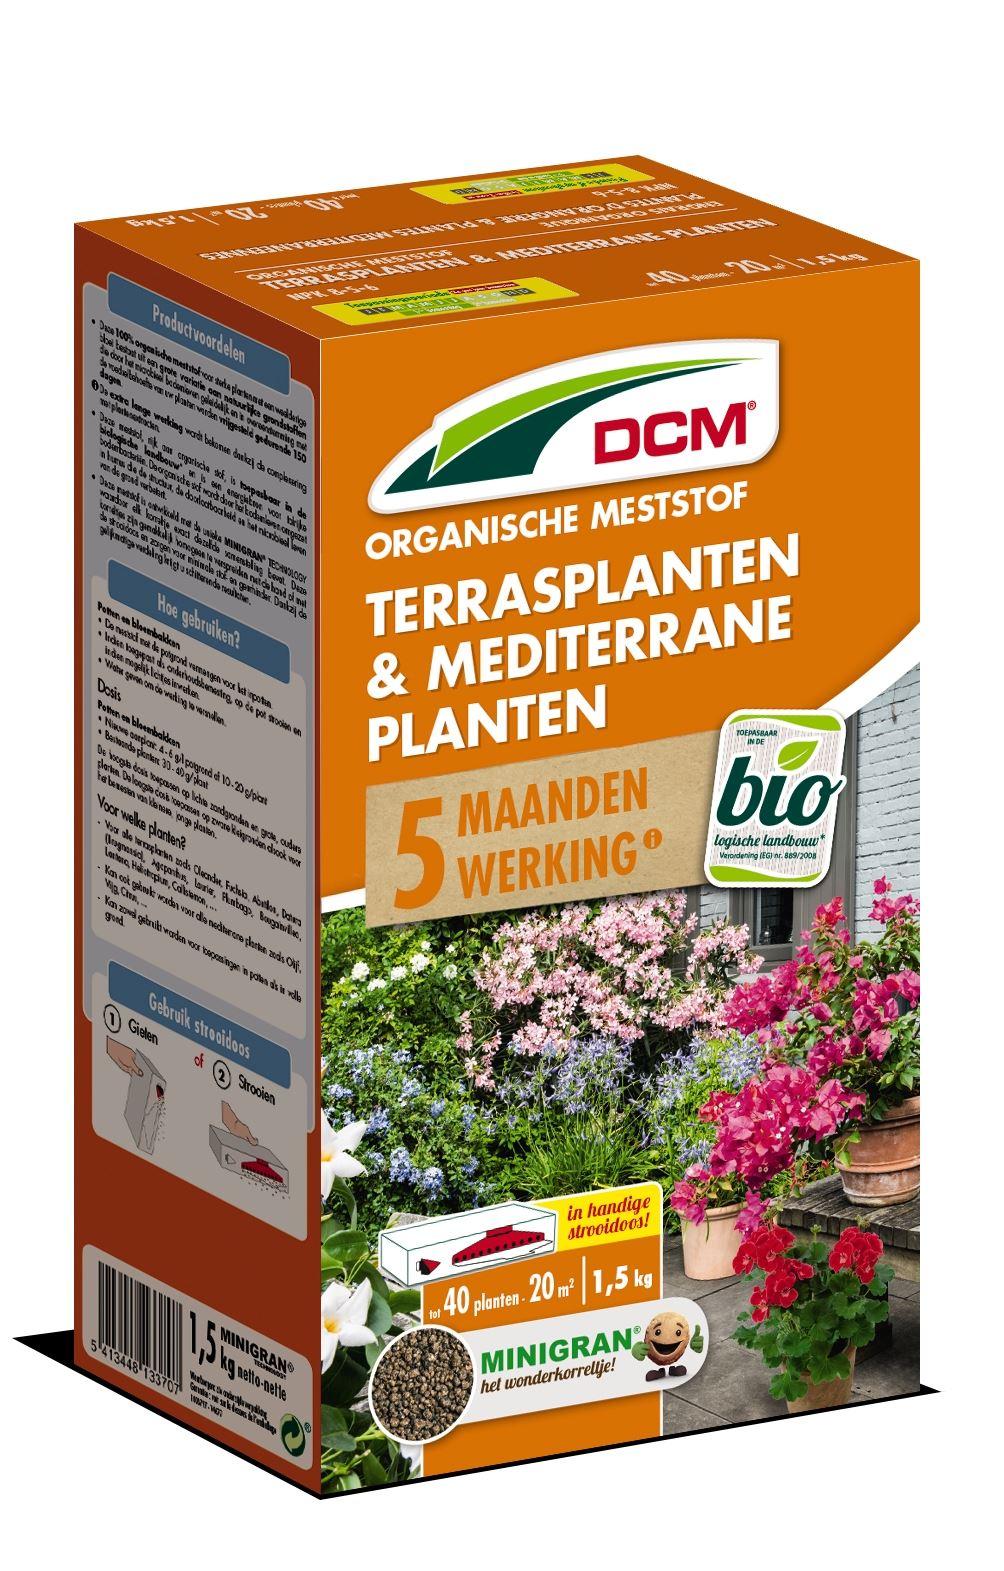 Meststof terrasplanten & mediterrane planten 1,5kg - Bio